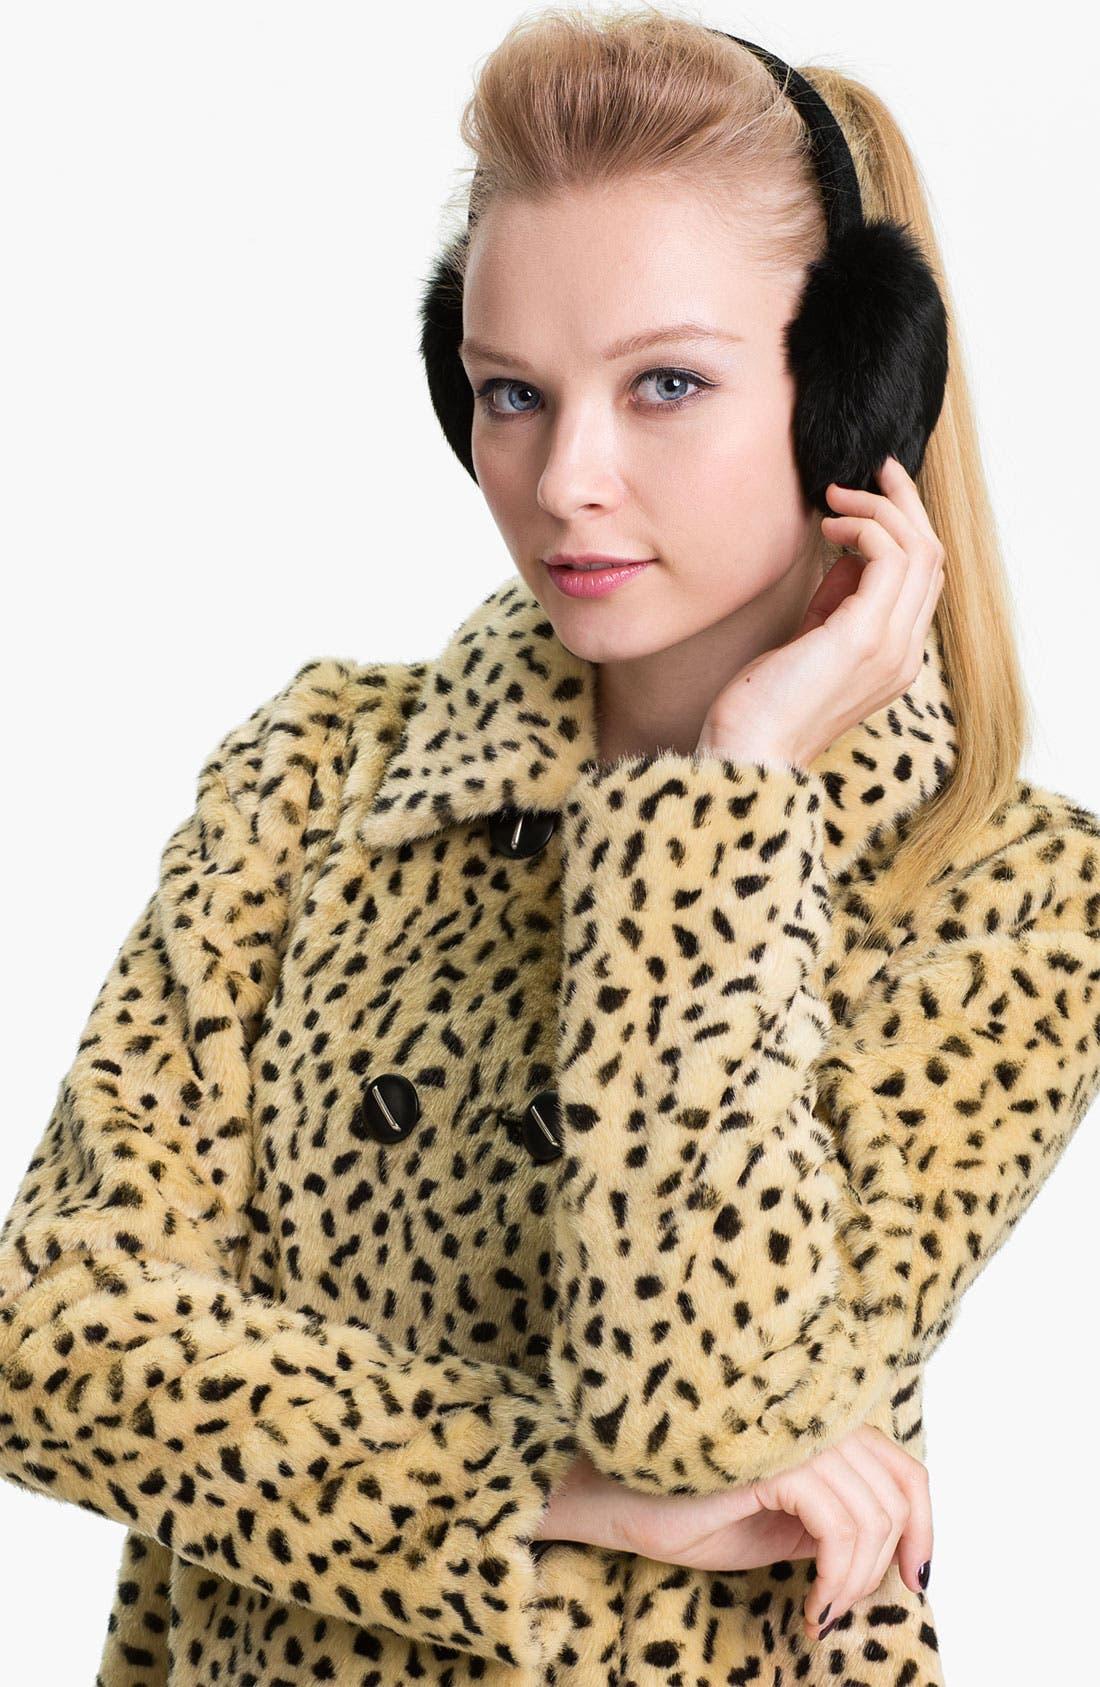 Alternate Image 1 Selected - Dena Products Genuine Rabbit Fur Earmuffs